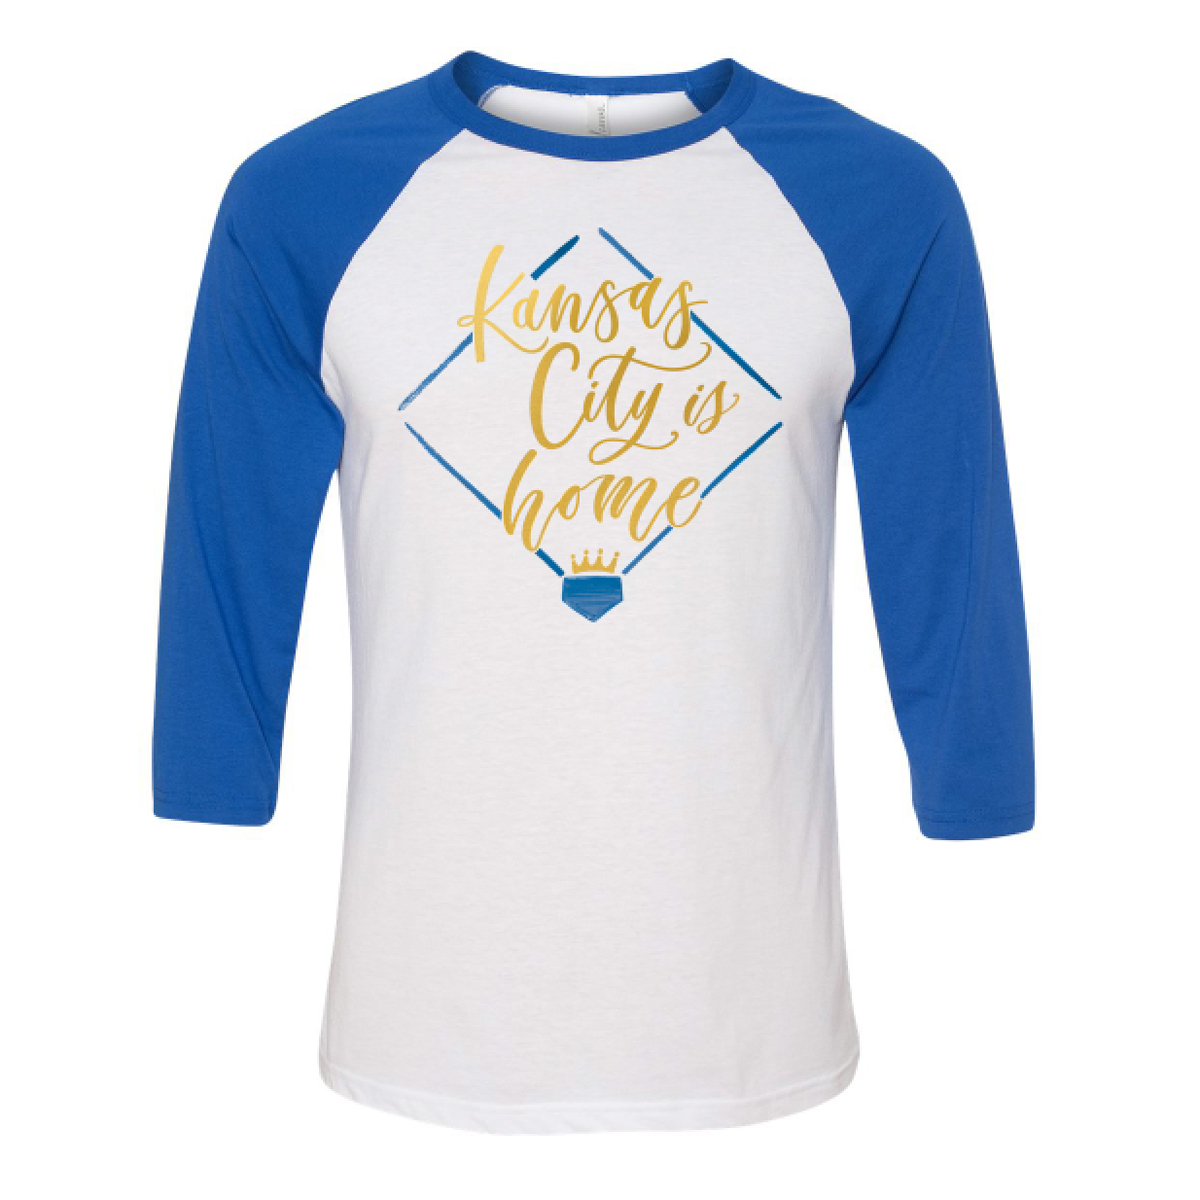 Kansas city is home baseball tee lauren heim studio for Custom shirts kansas city